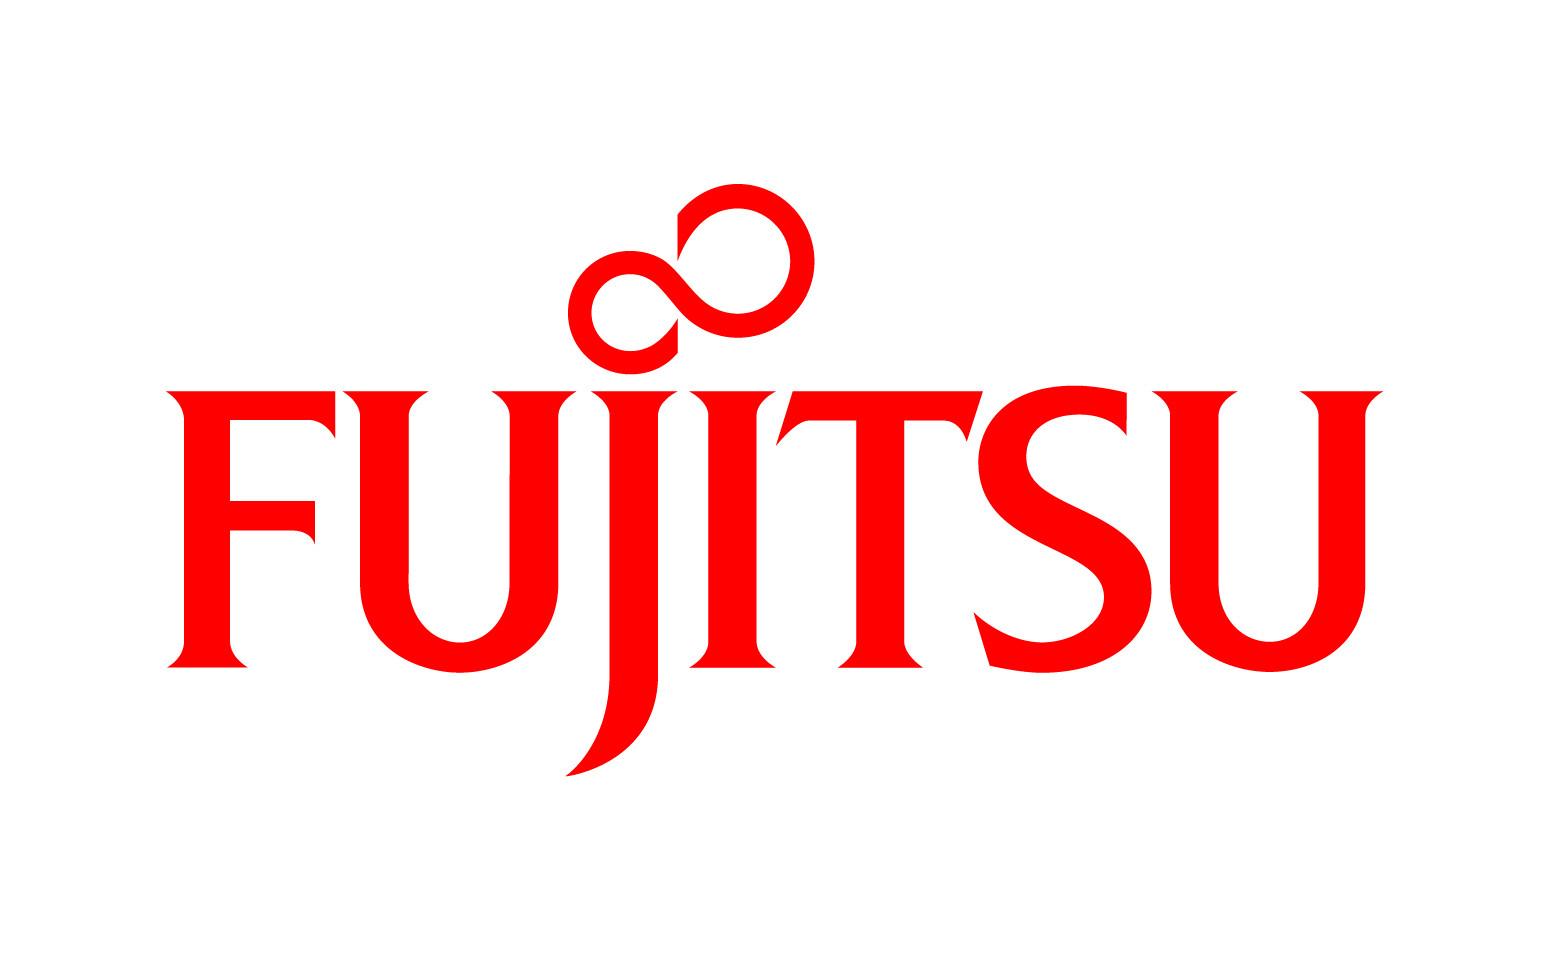 FUJITSUロゴ.jpg